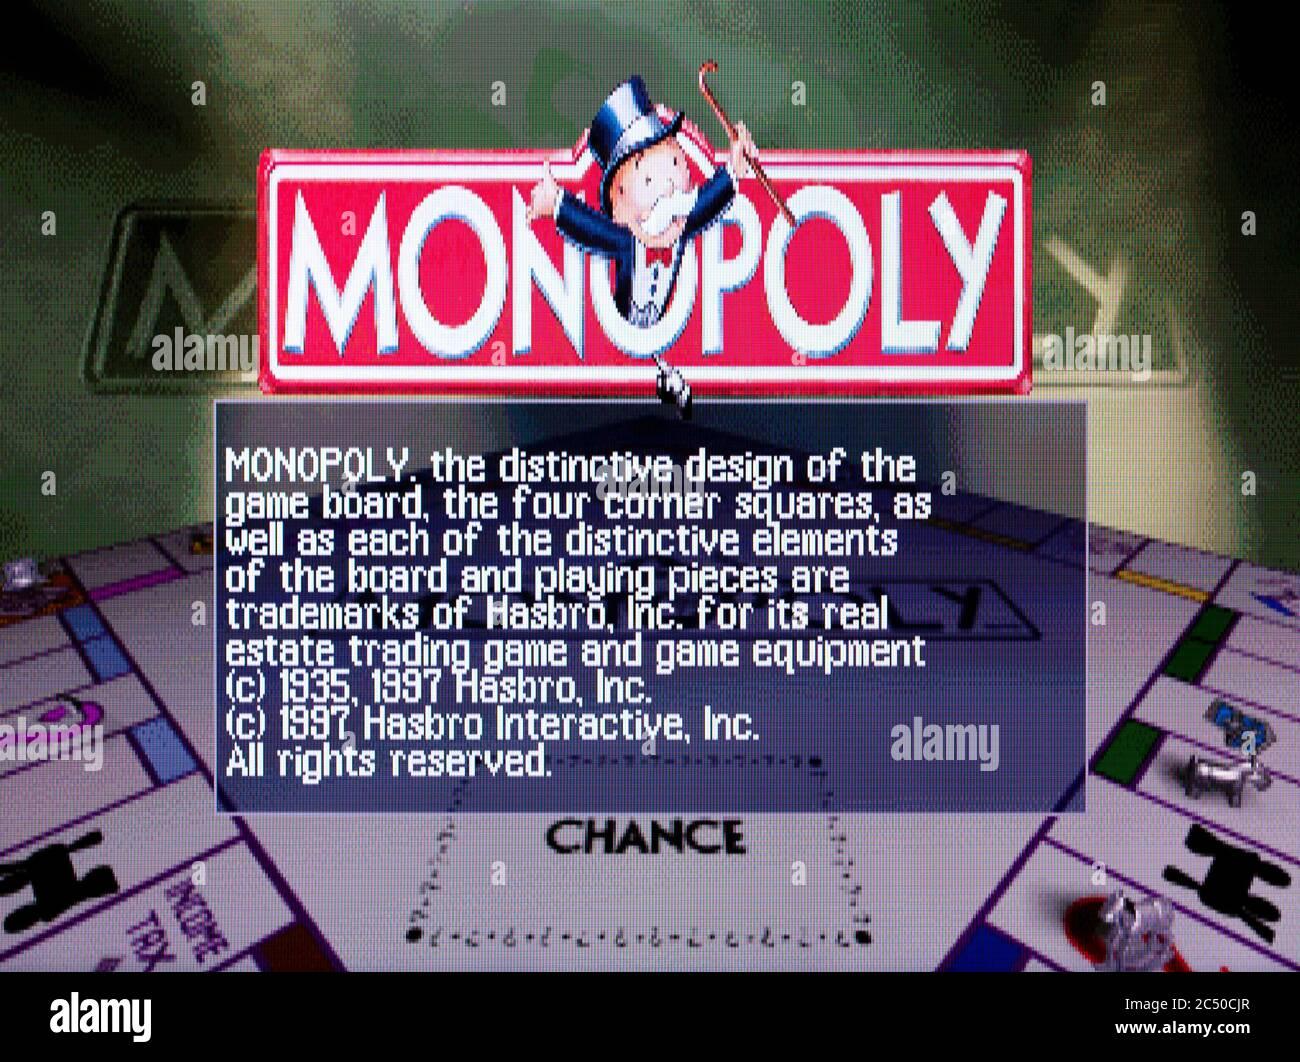 Monopoly - Sony PlayStation 1 PS1 PSX - solo para uso editorial Foto de stock